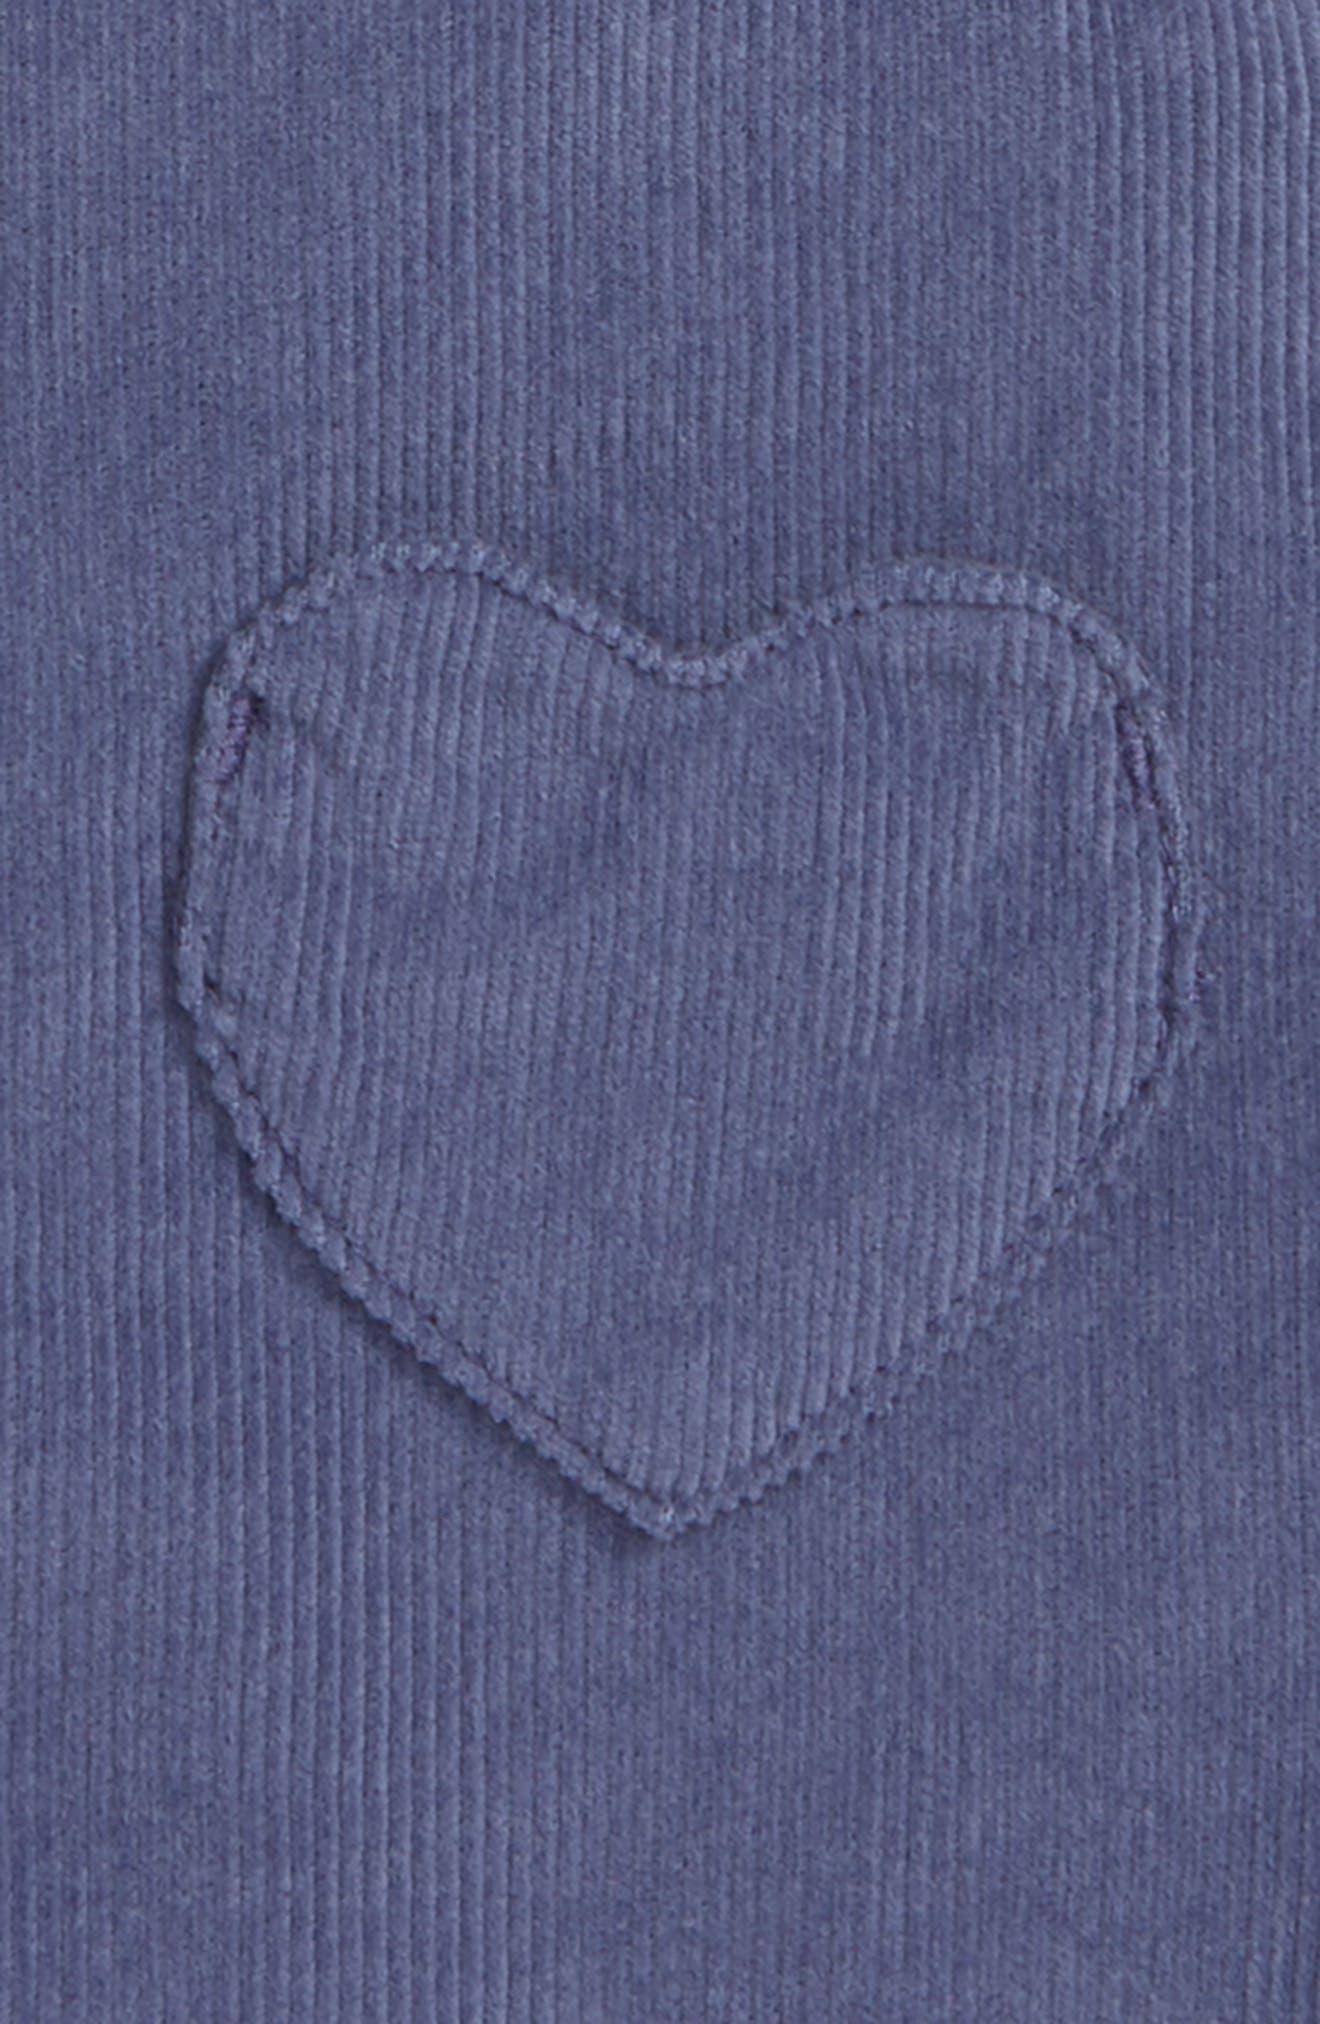 MINI BODEN, Patch Pocket Corduroy Dress, Alternate thumbnail 3, color, PRP VIOLET GREY